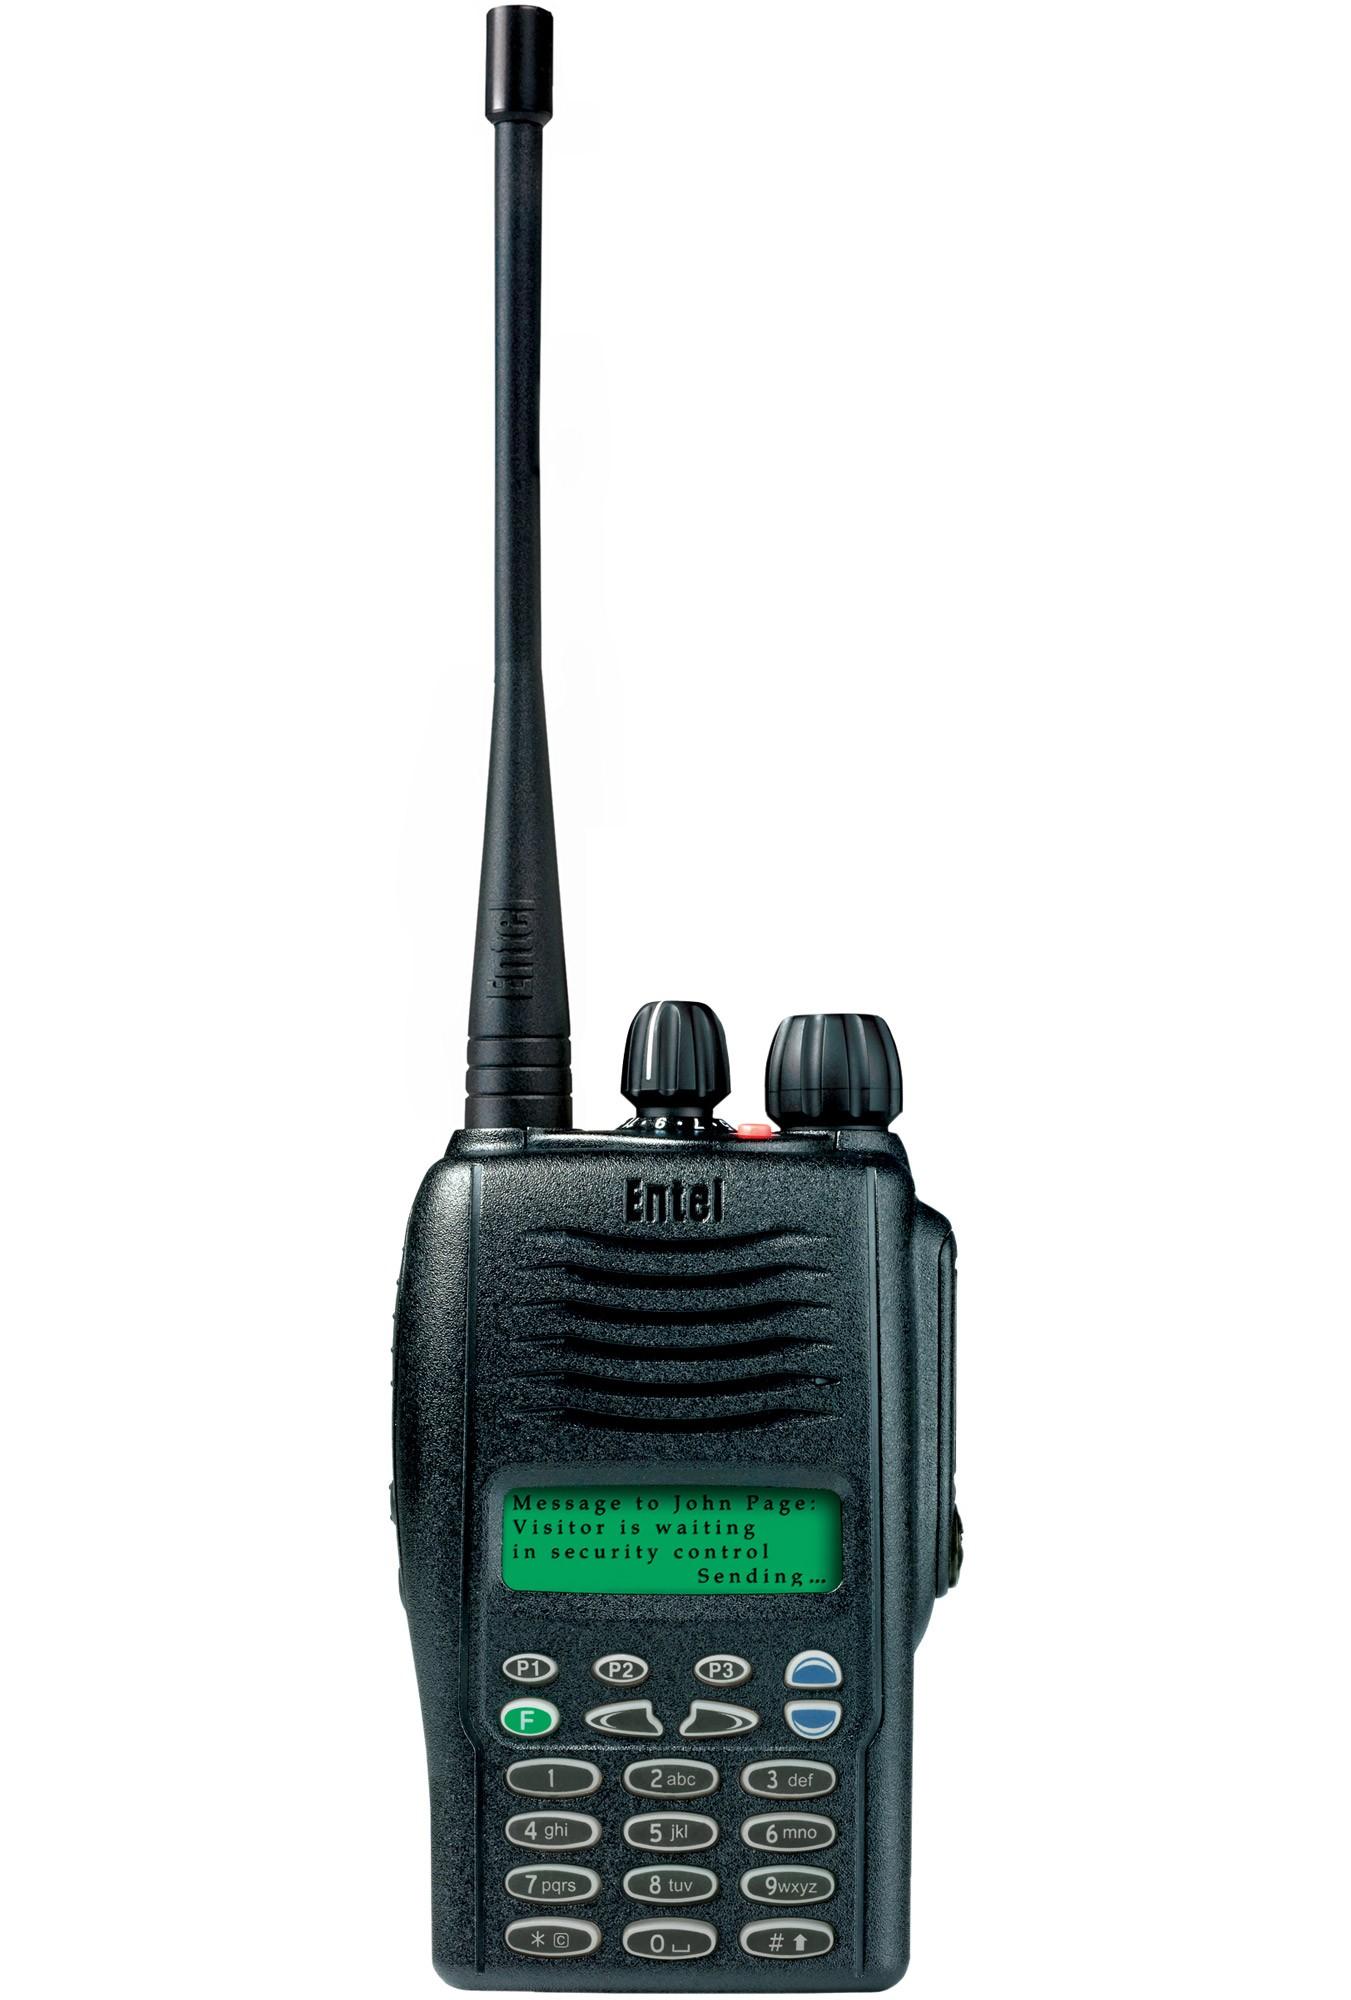 Entel HX486 Two Way Radio